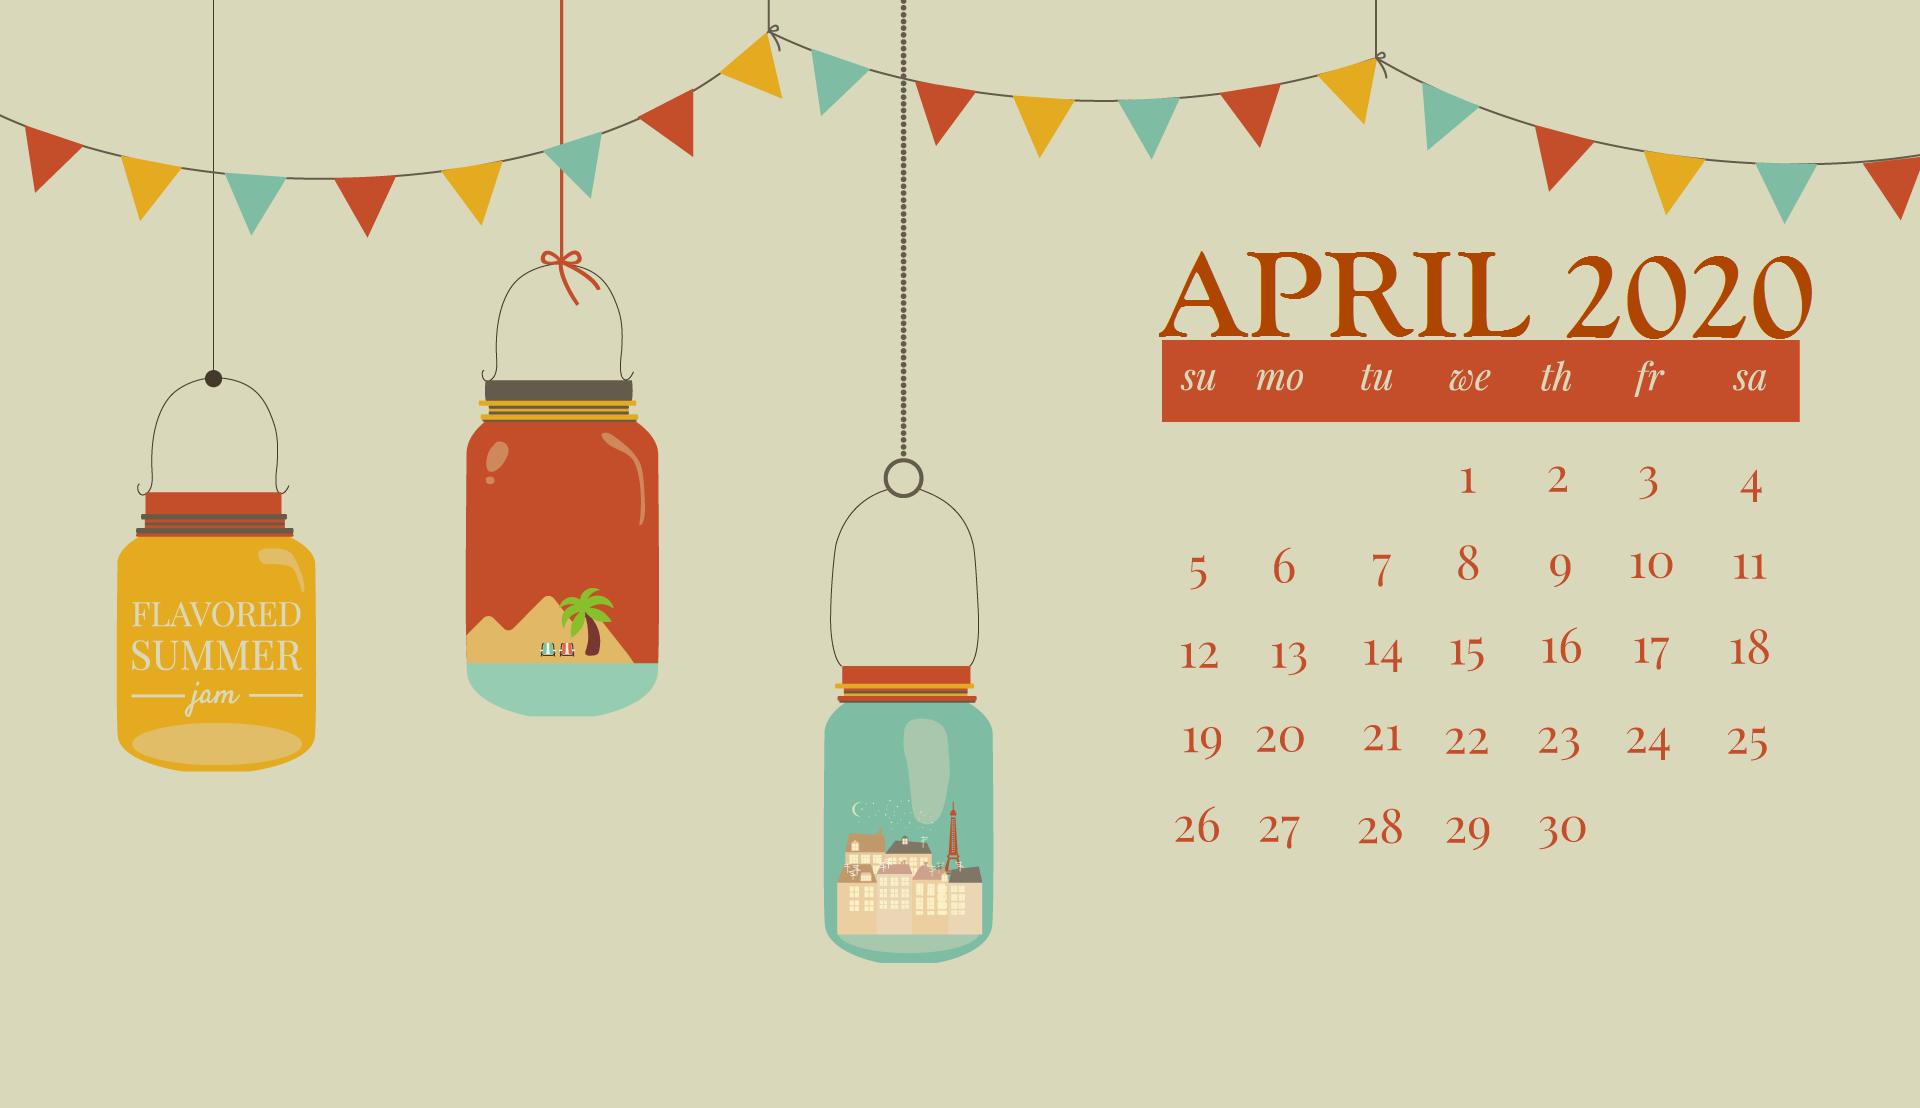 April 2020 Desktop Calendar Wallpaper In 2020 Calendar Wallpaper Desktop Wallpaper Calendar Desktop Calendar